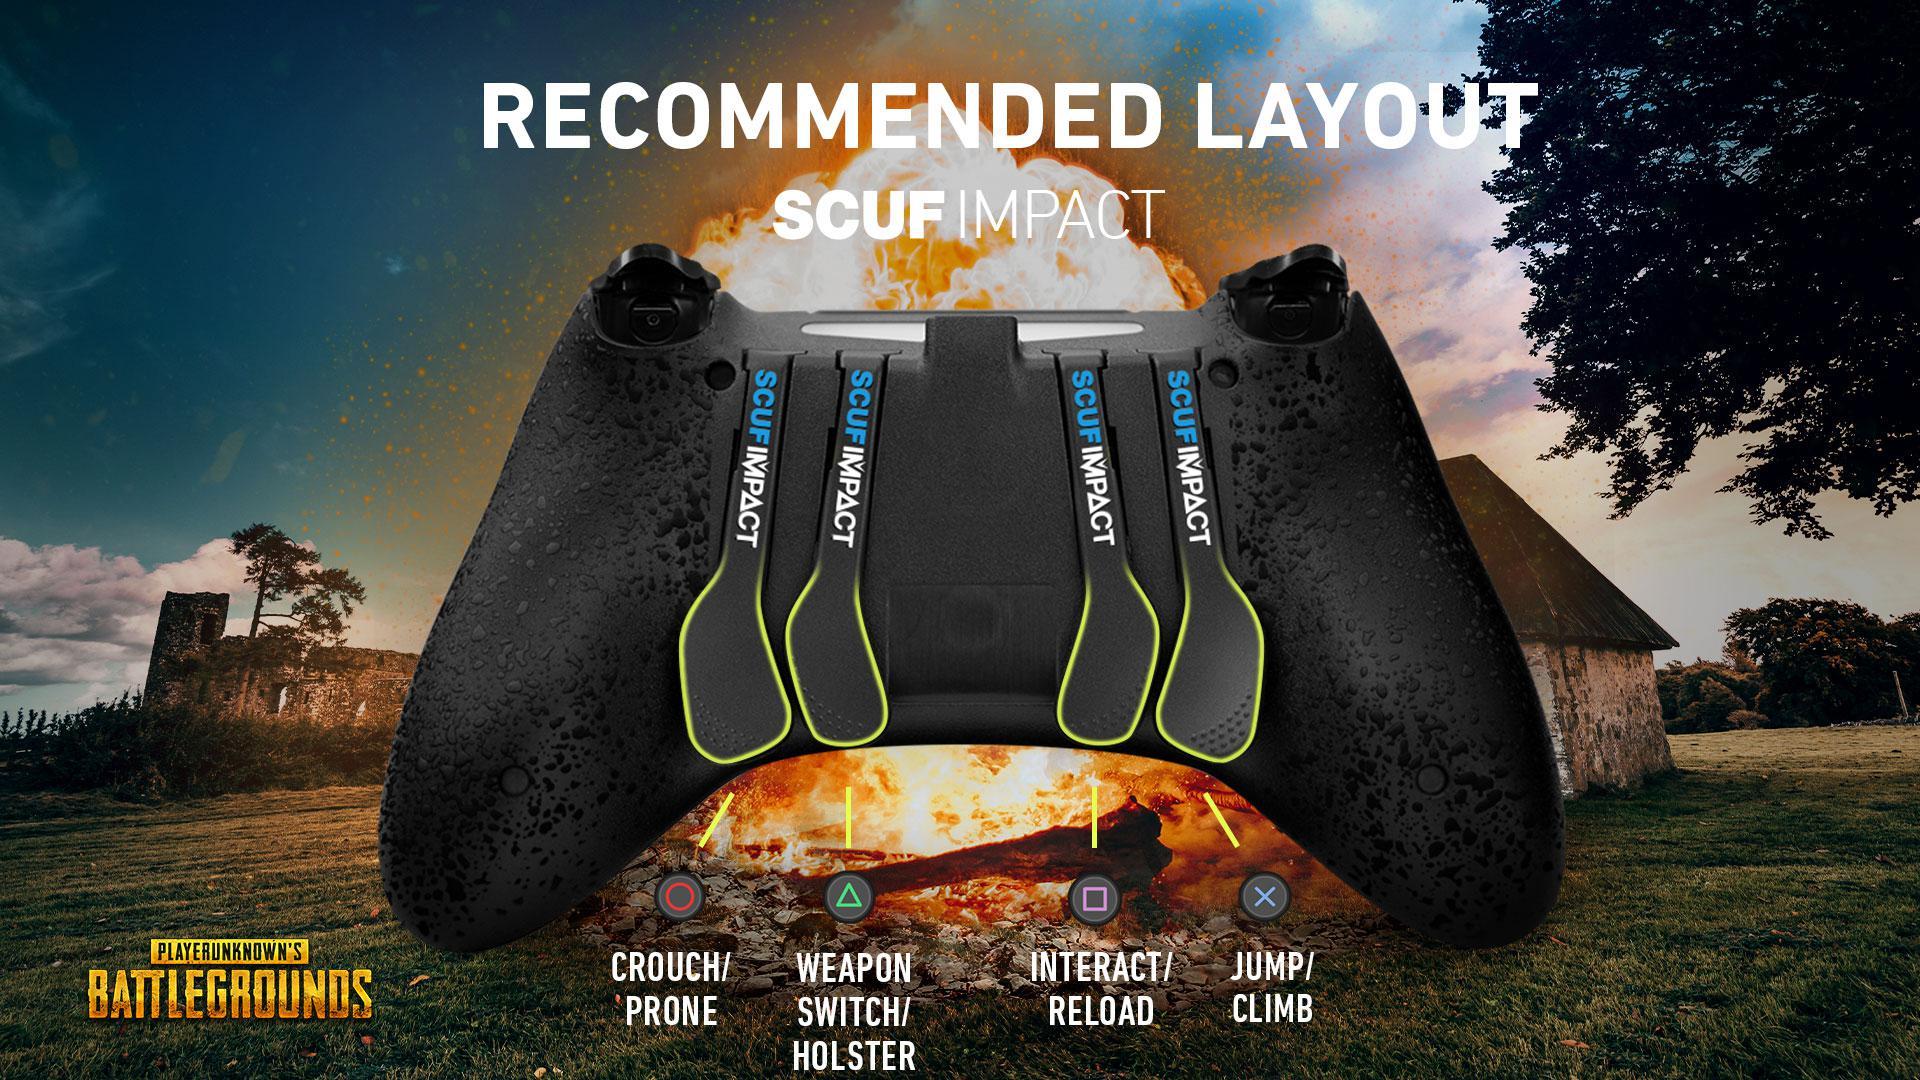 SCUF IMPACT PUBG PS4 PC CONTROLLER SETUP